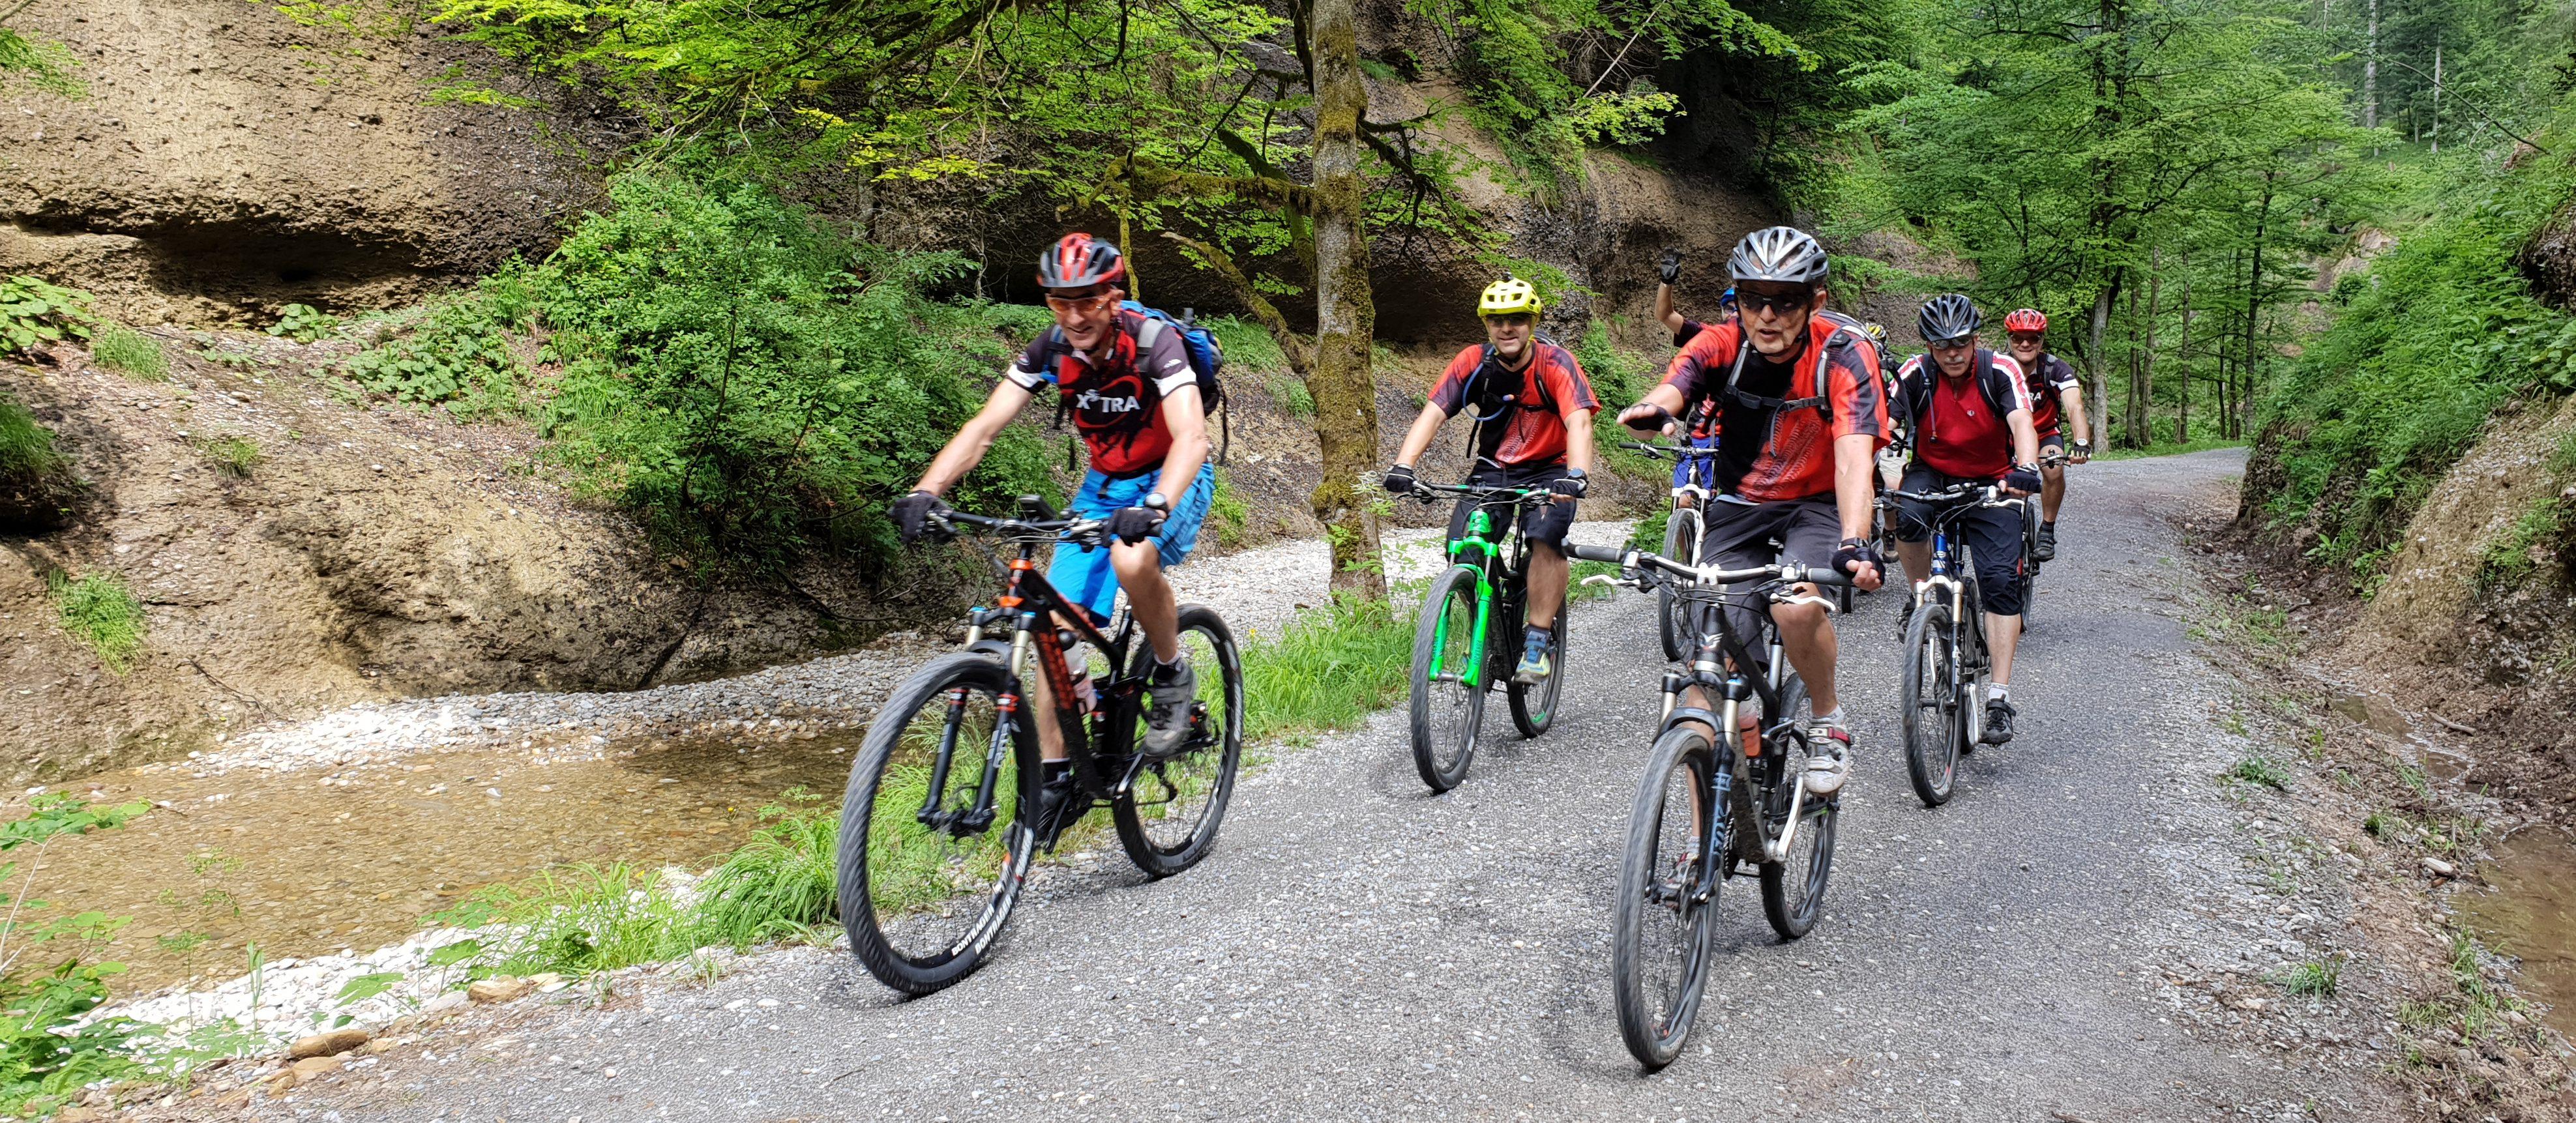 Biketour Bäretswil